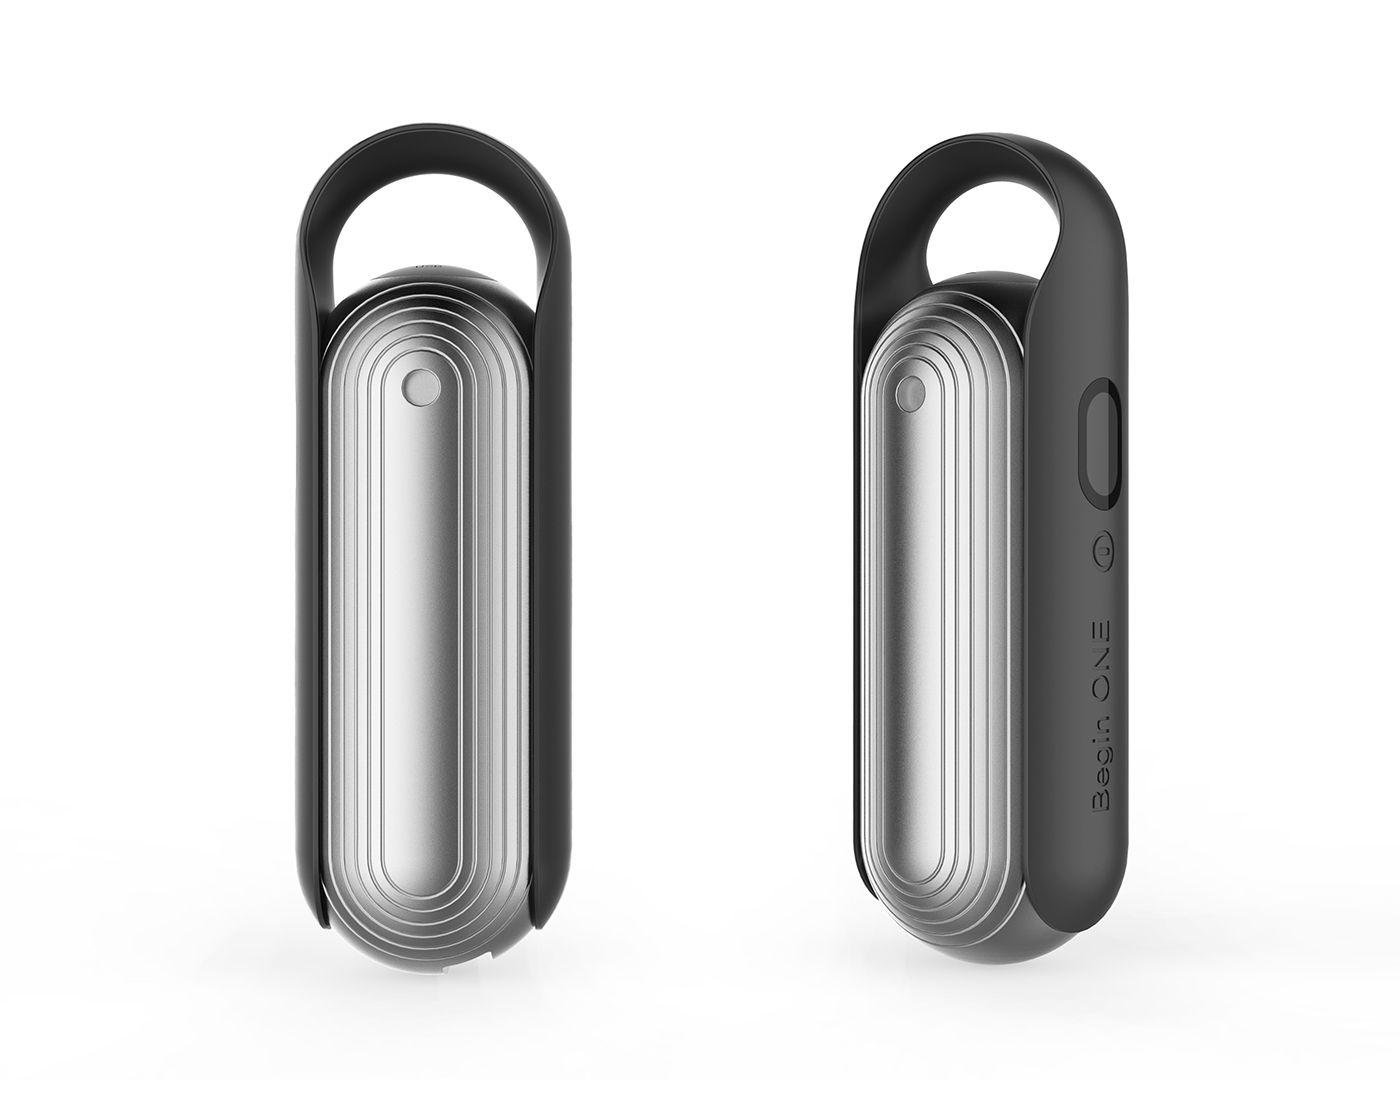 Pin By Adam Manley On Pulp Project In 2020 Bottle Design Speaker Design Metal Bottles